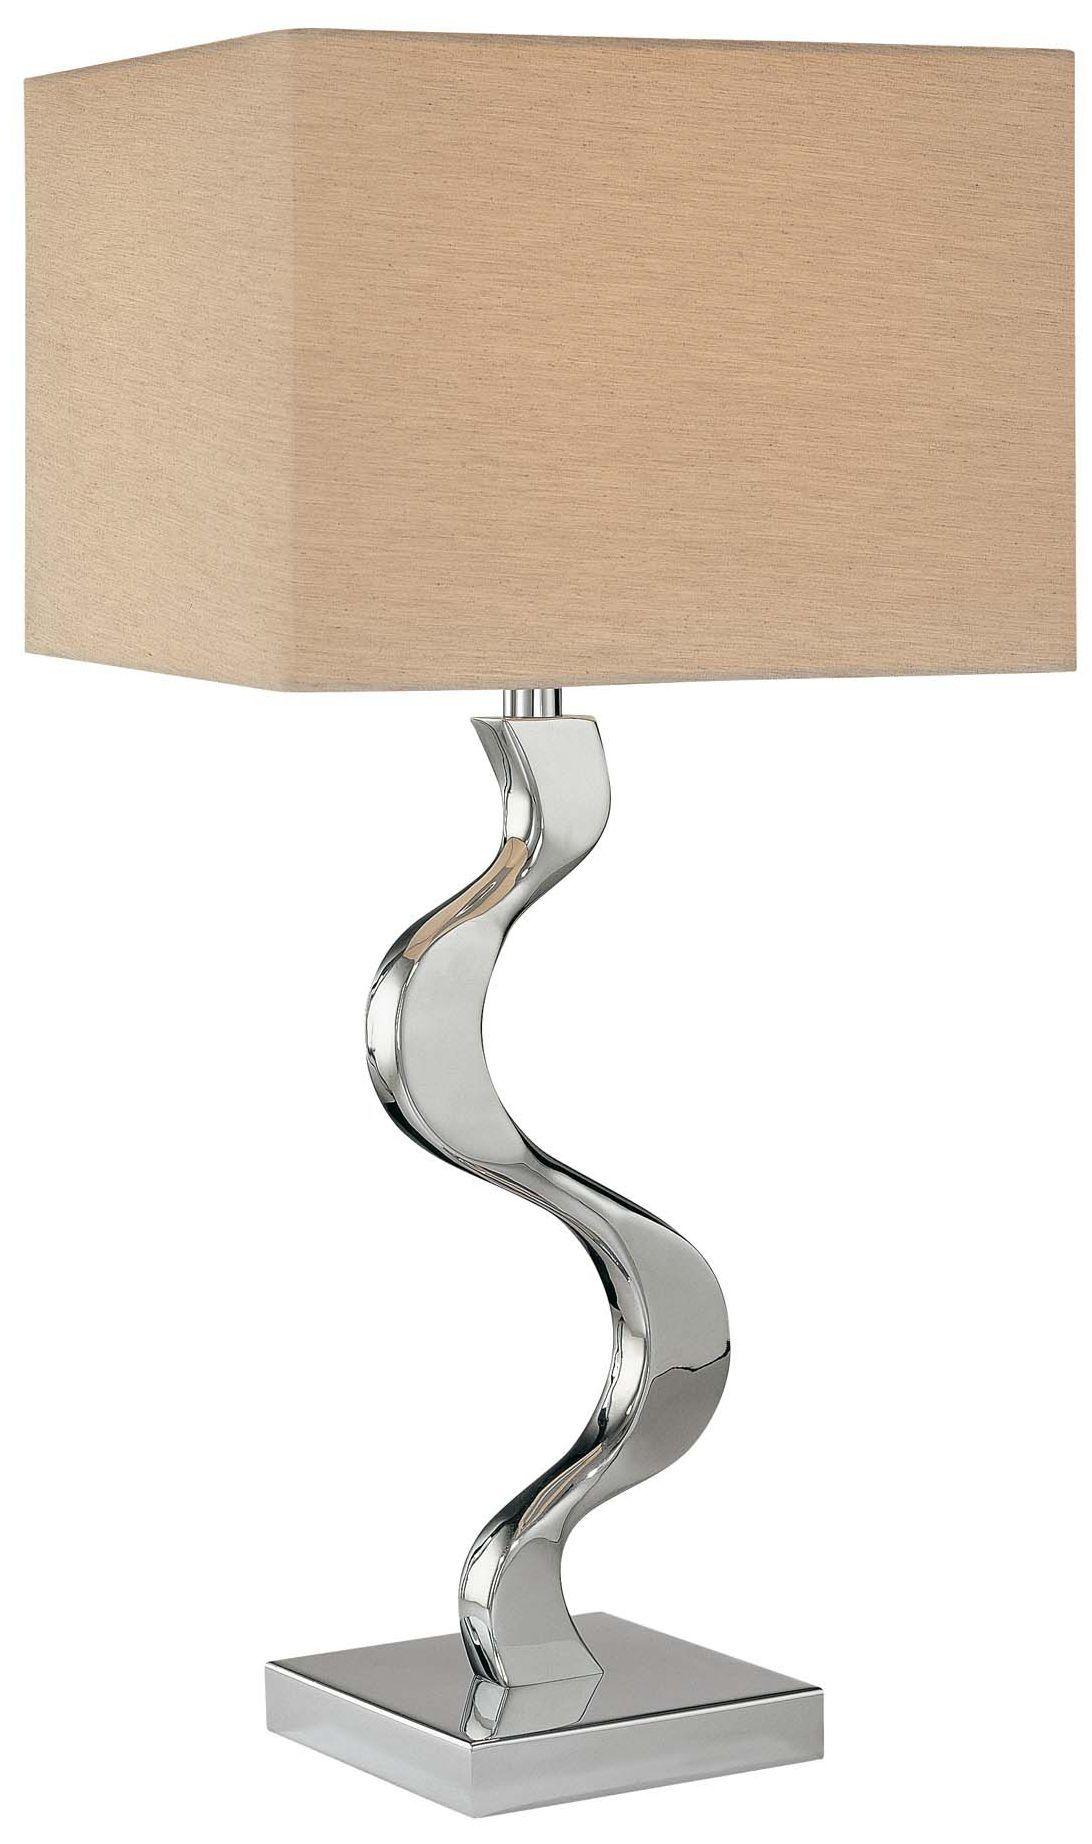 Grey Cross Silk Shade George Kovacs Table Lamp Eurostylelighting Com Chrome Table Lamp Lamp Table Lamp